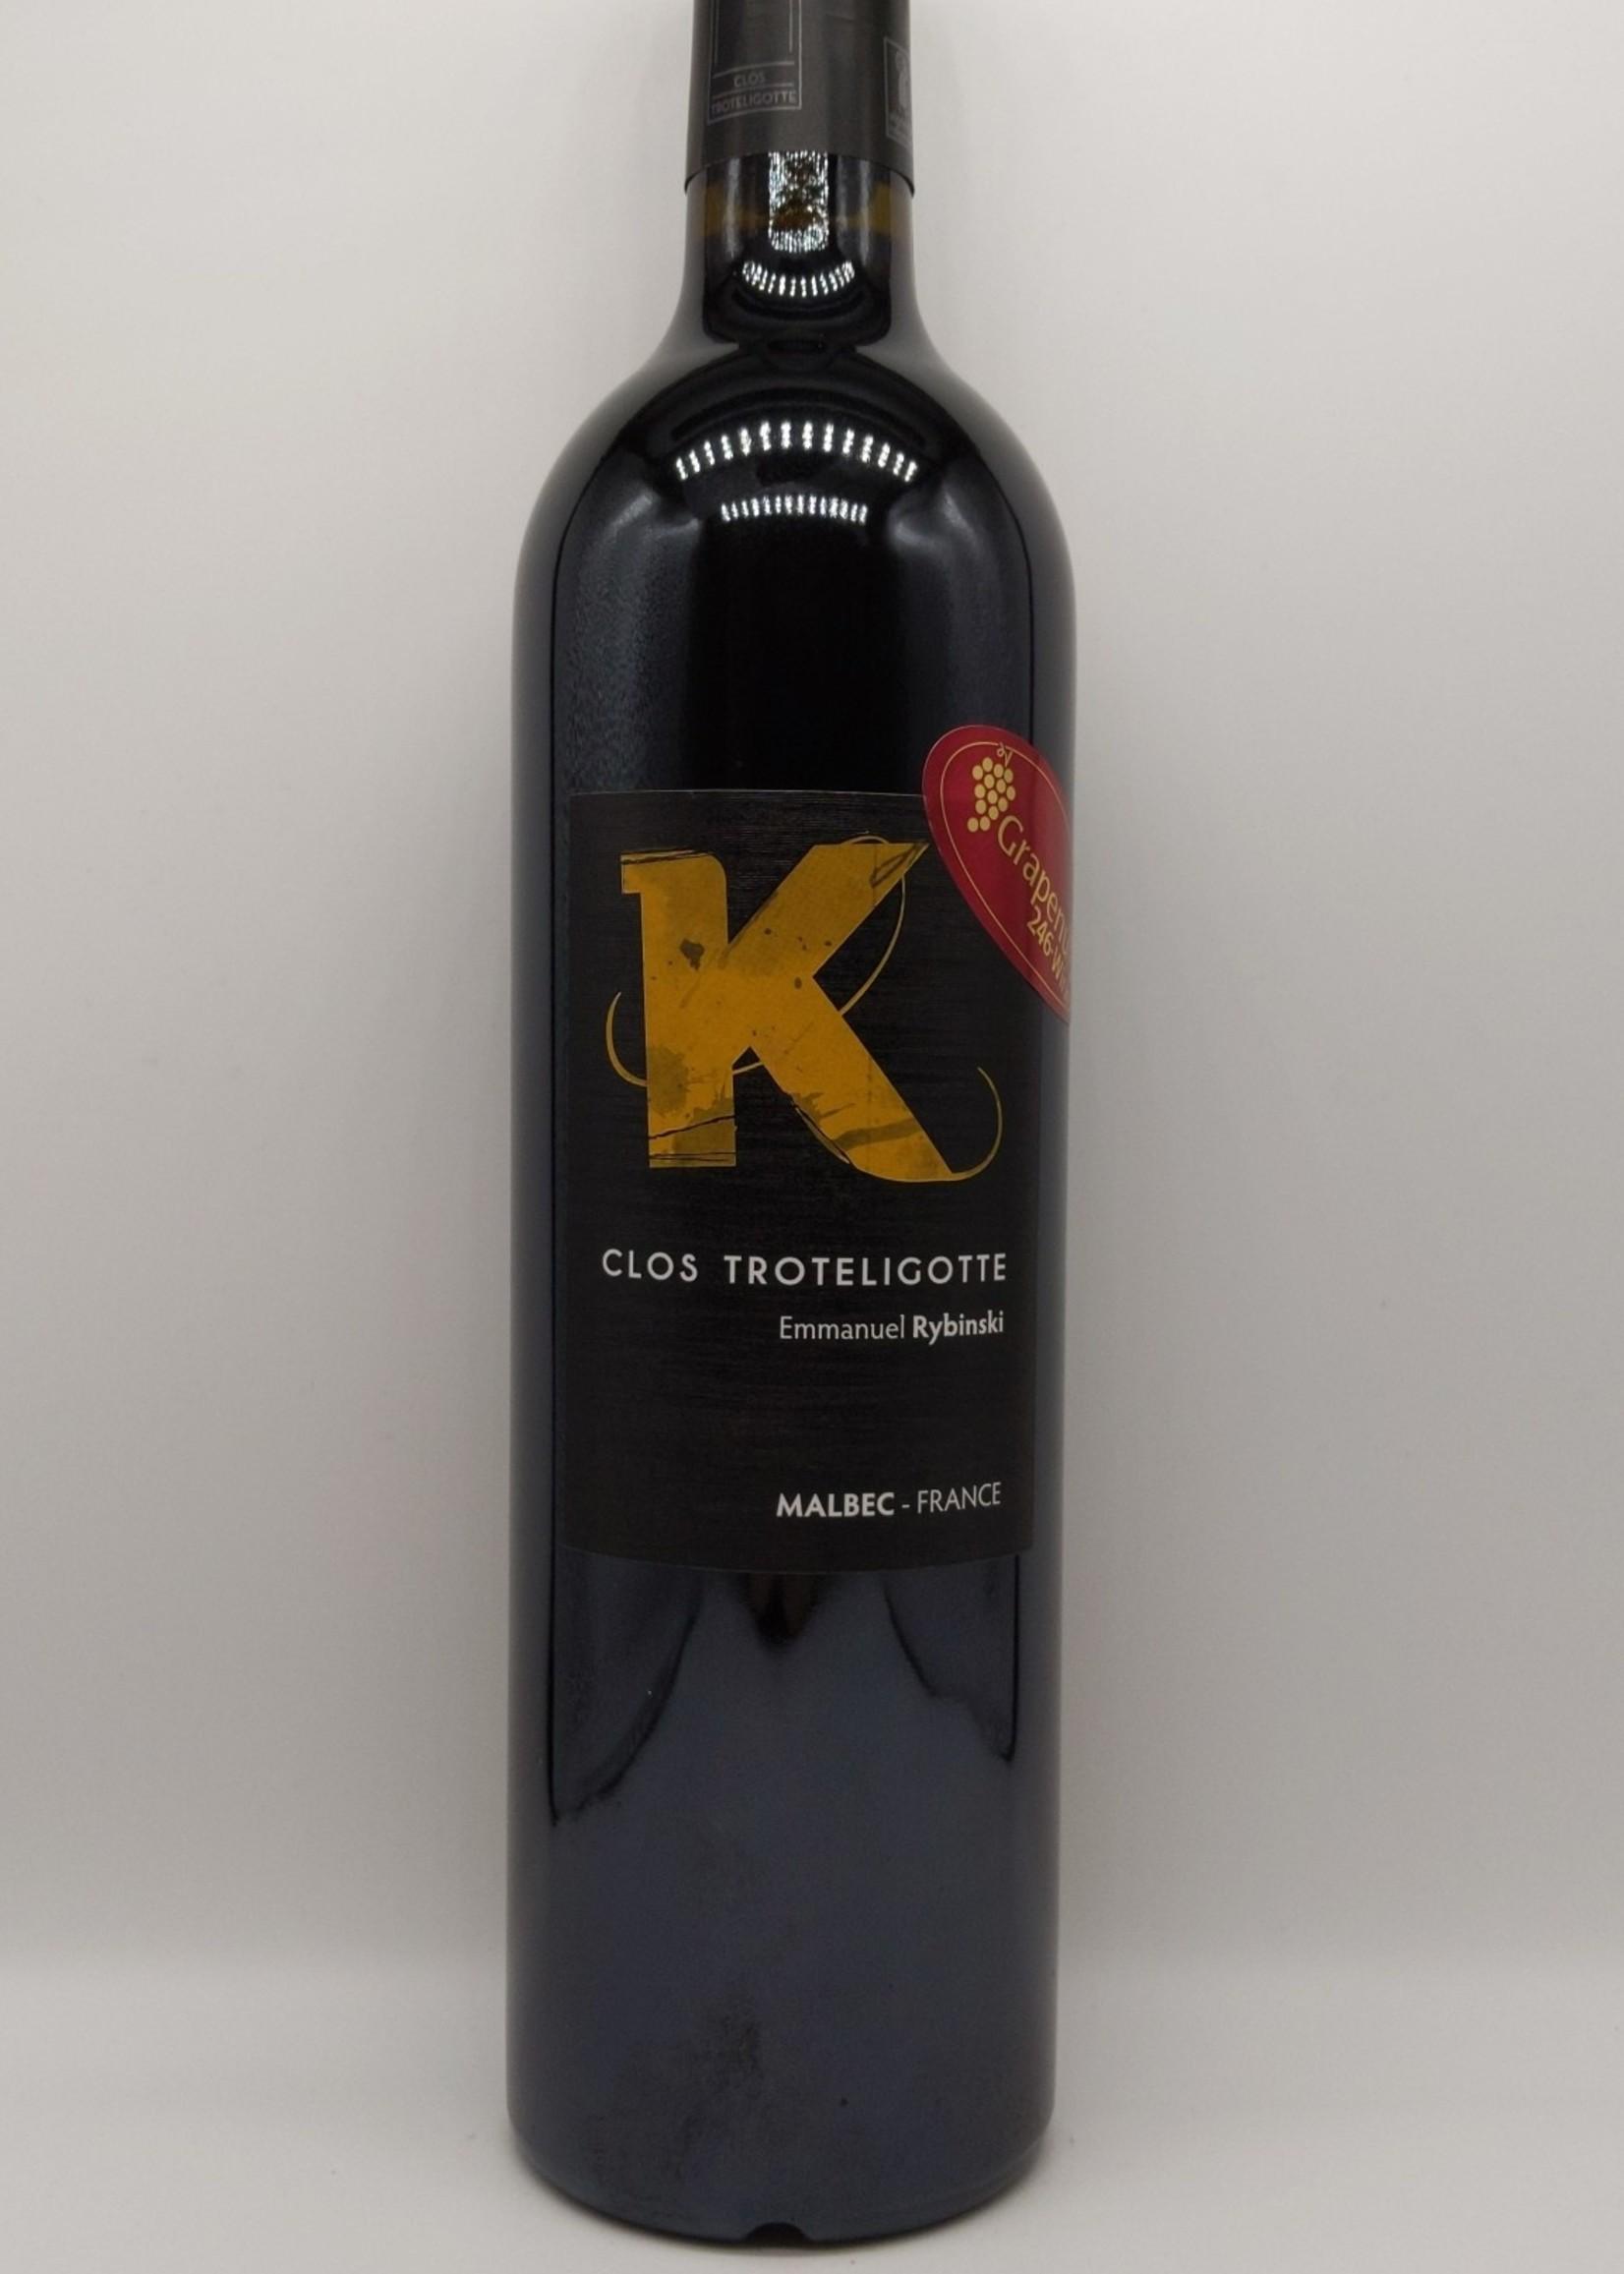 2012 CLOS TROTELIGOTTE K-LYS MALBEC 750ml